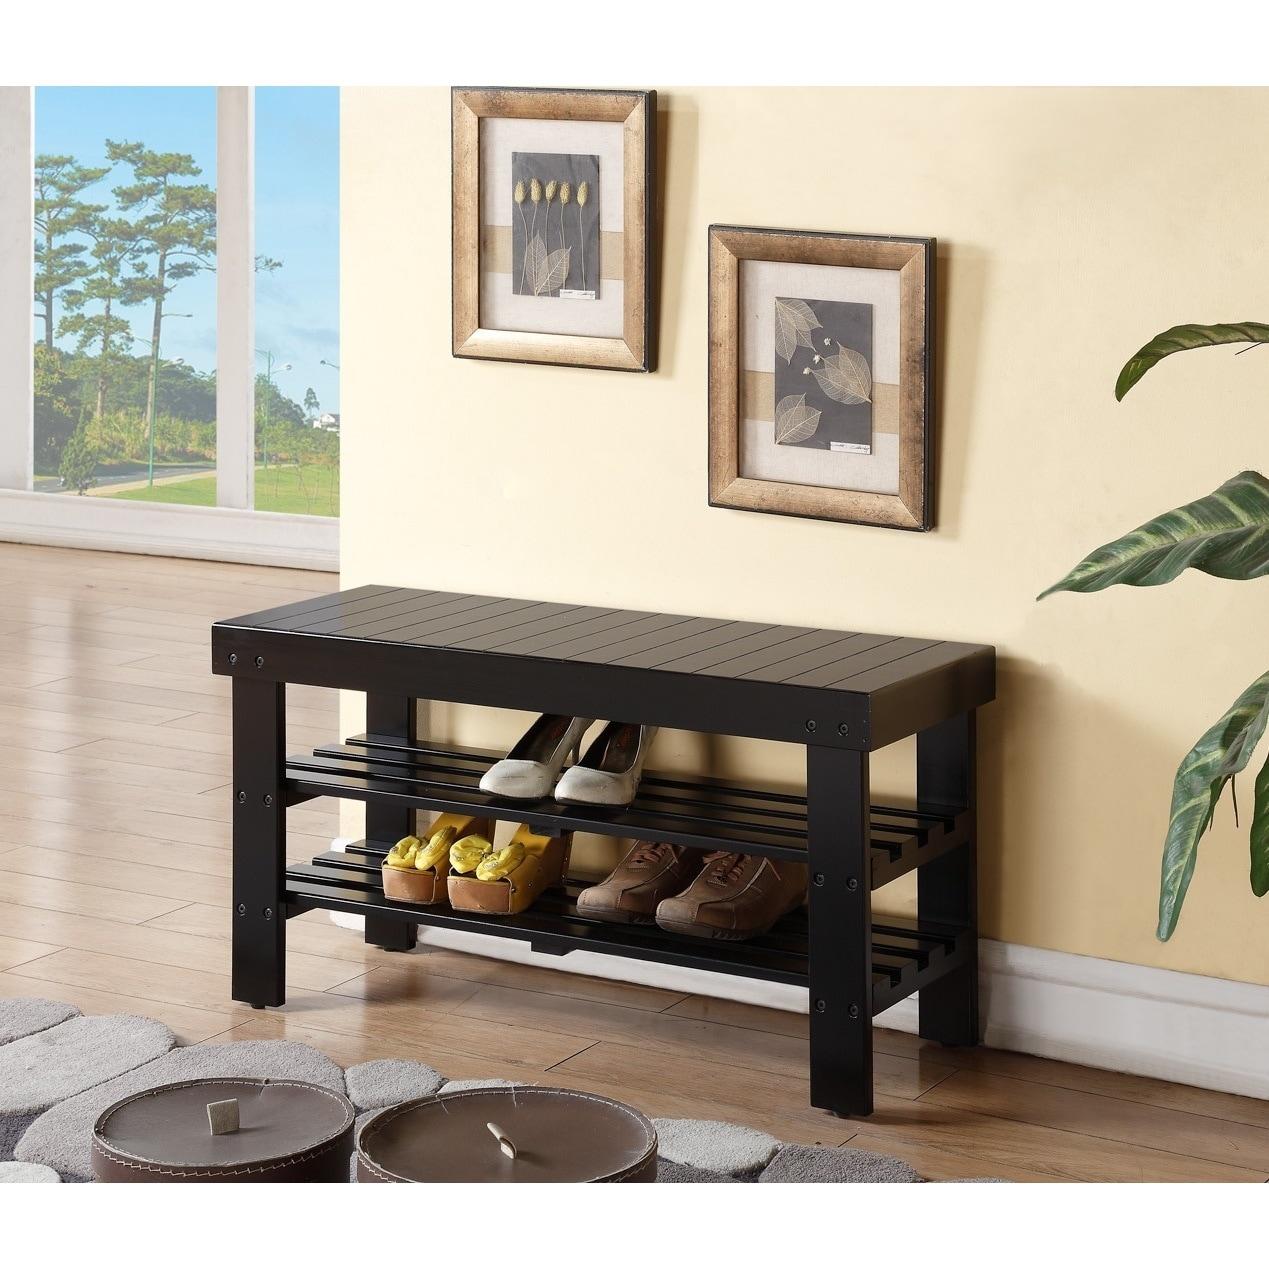 Black Solid Wood Shoe Shelf Bench (Black Shoe bench)